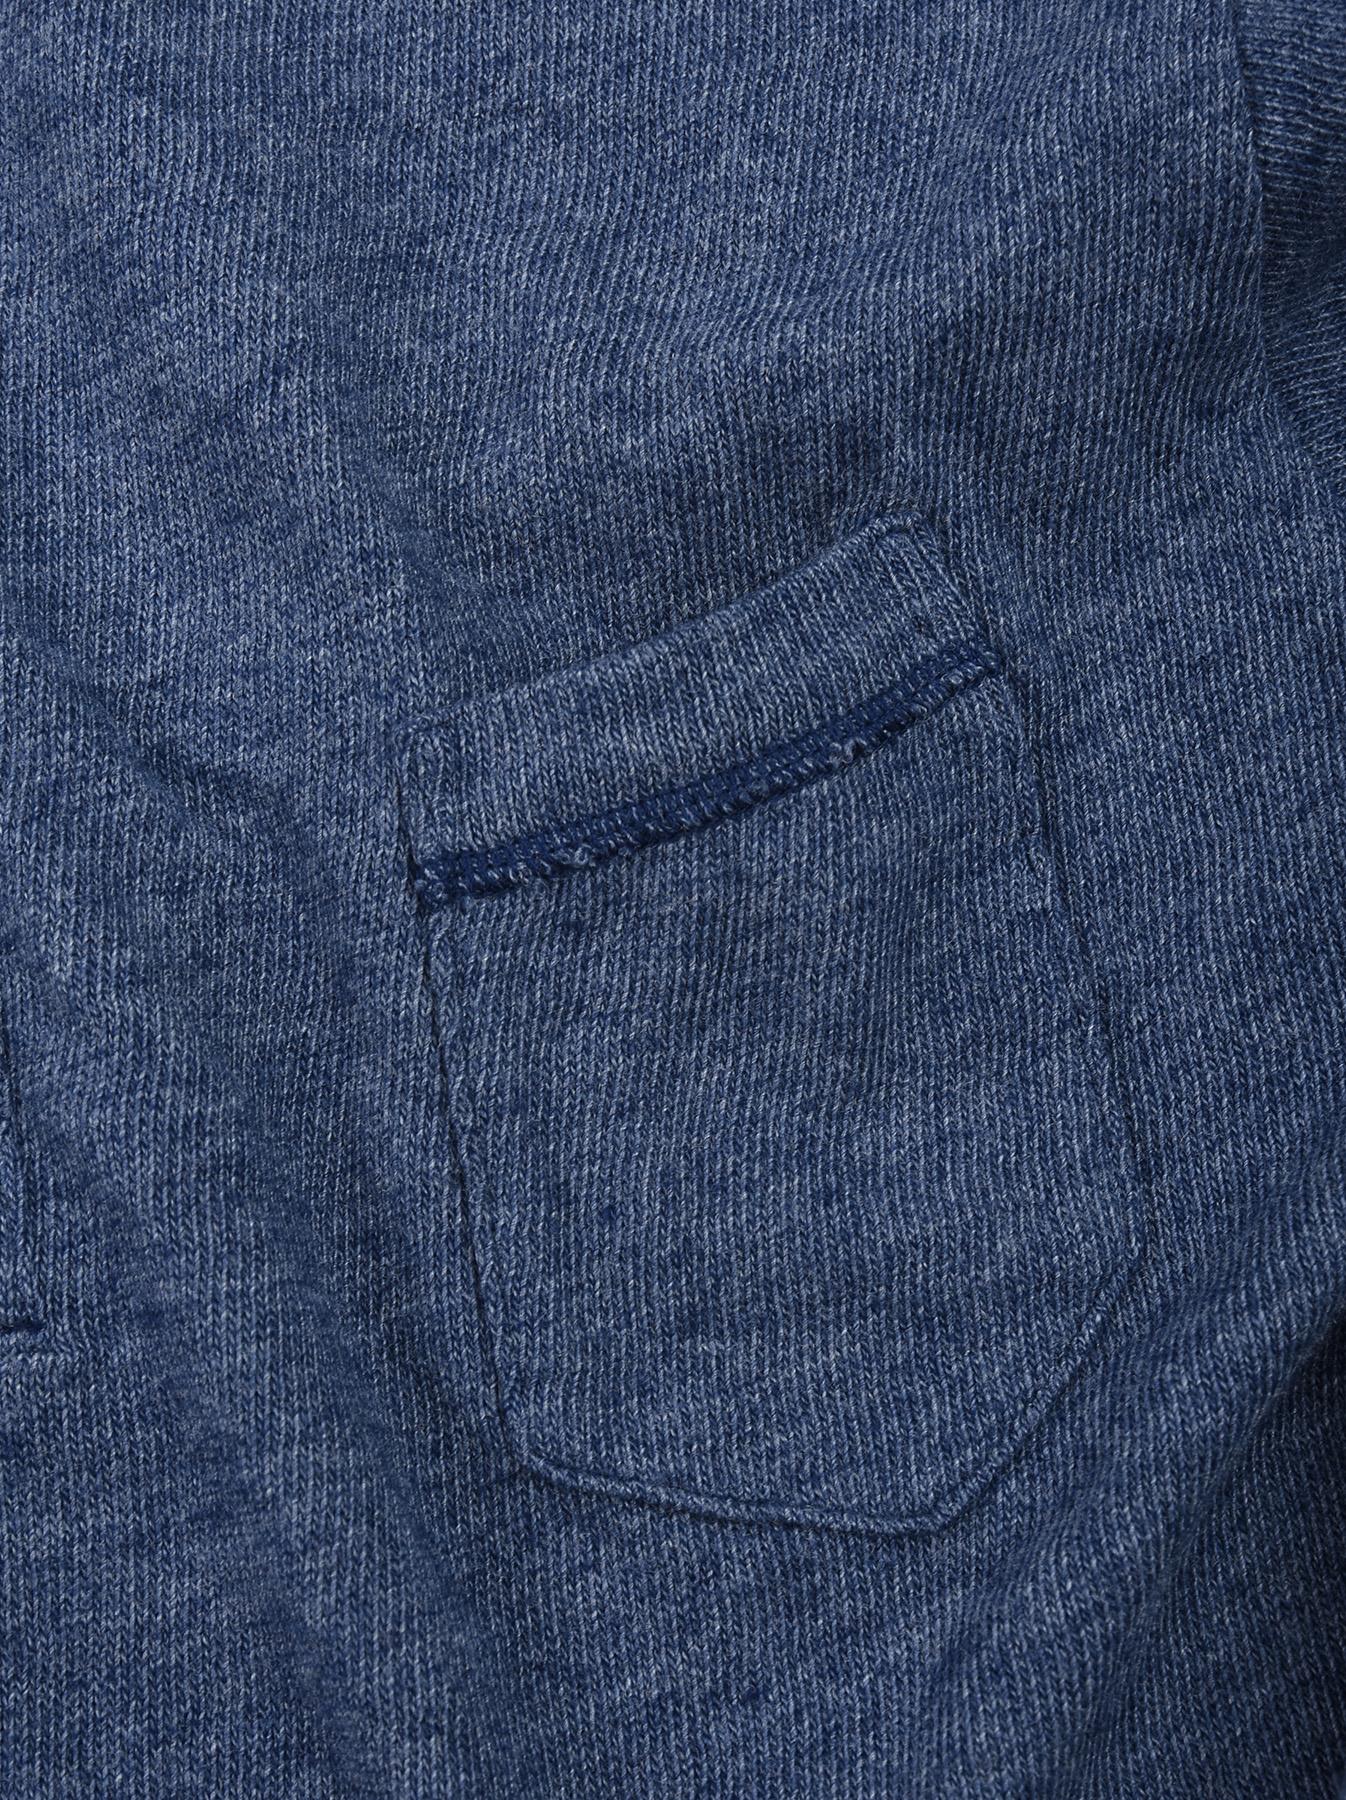 Low-gauge Tenjiku Long-sleeved Henley-10